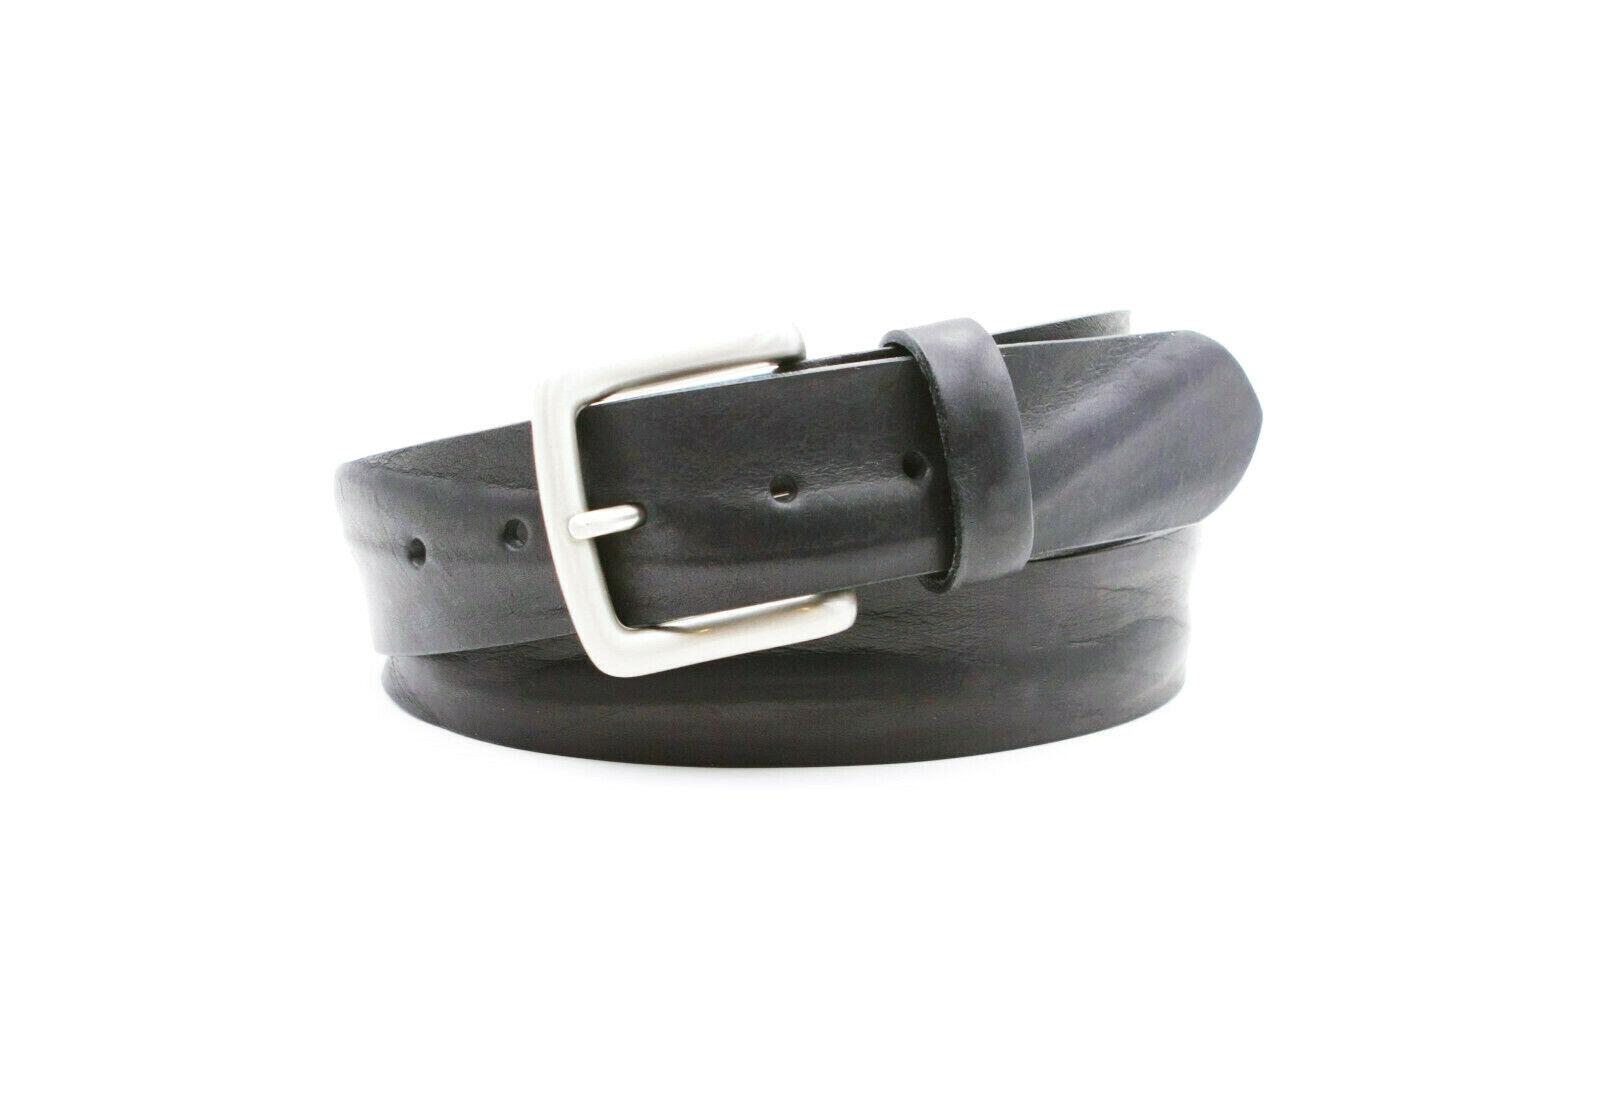 Ledergürtel Herren Echtleder Schwarz Leder Gürtel breit Jeansgürtel 4 cm